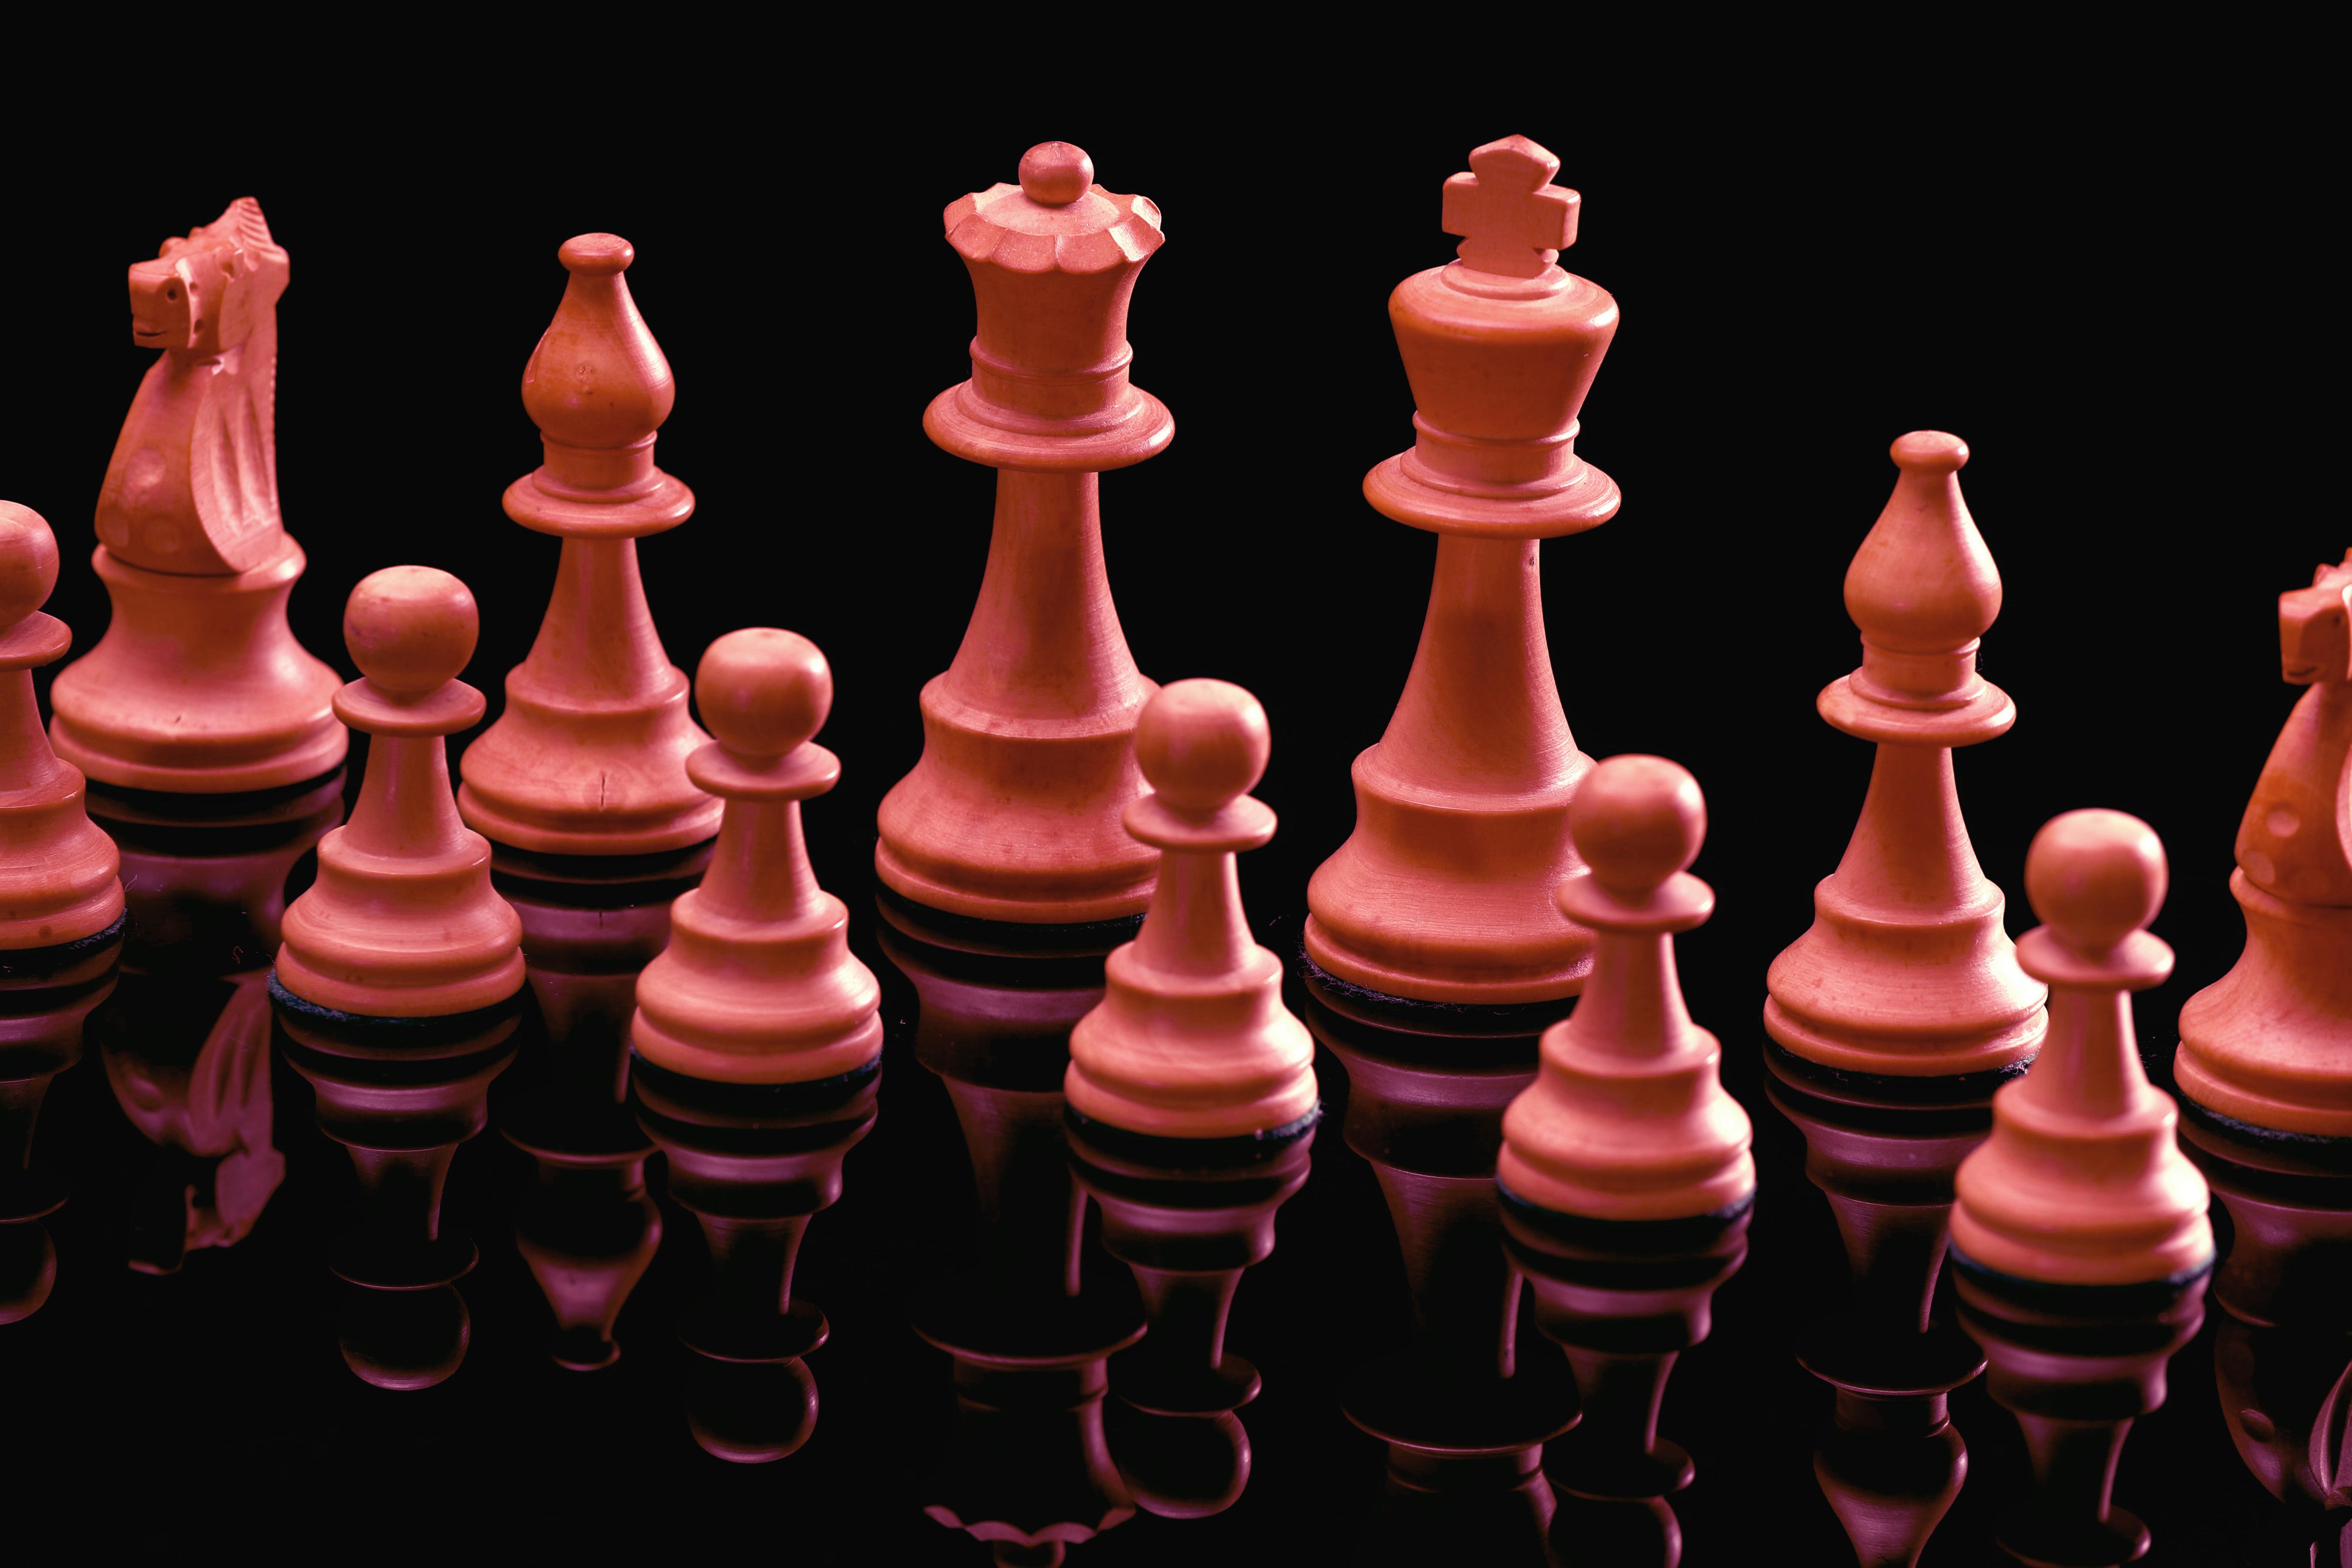 Refine your strategy